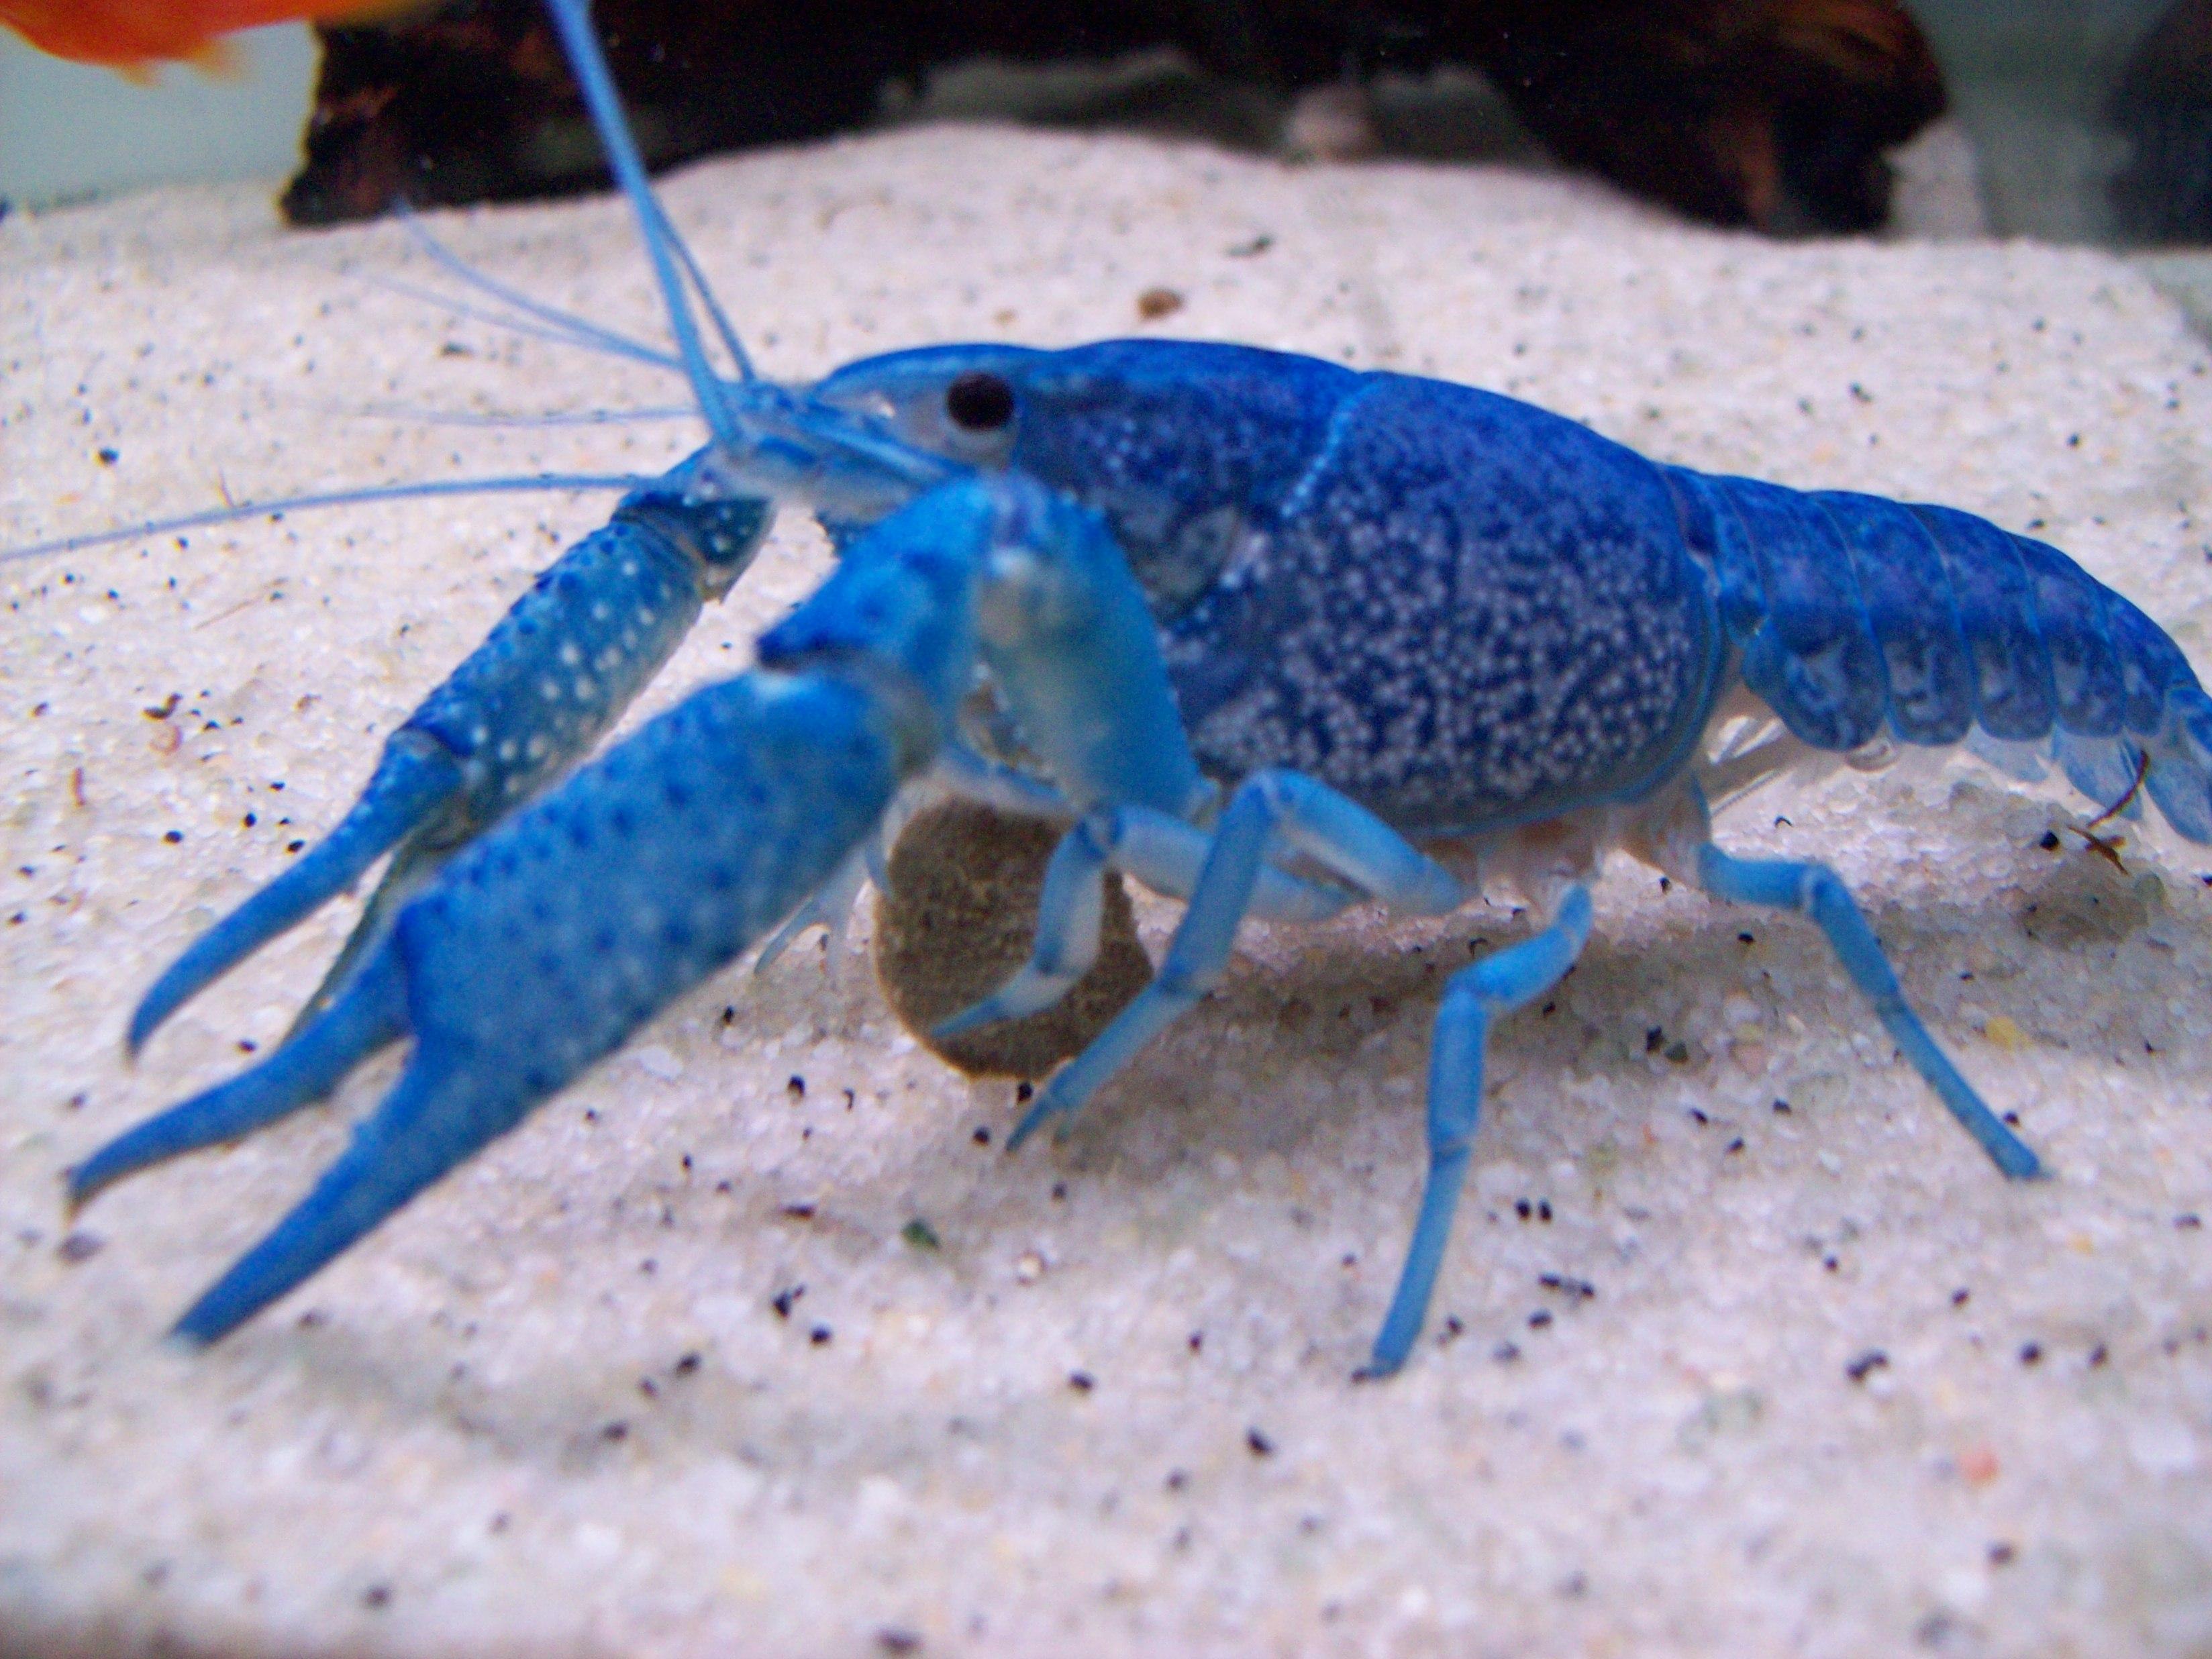 Blue Lobster (crayfish)